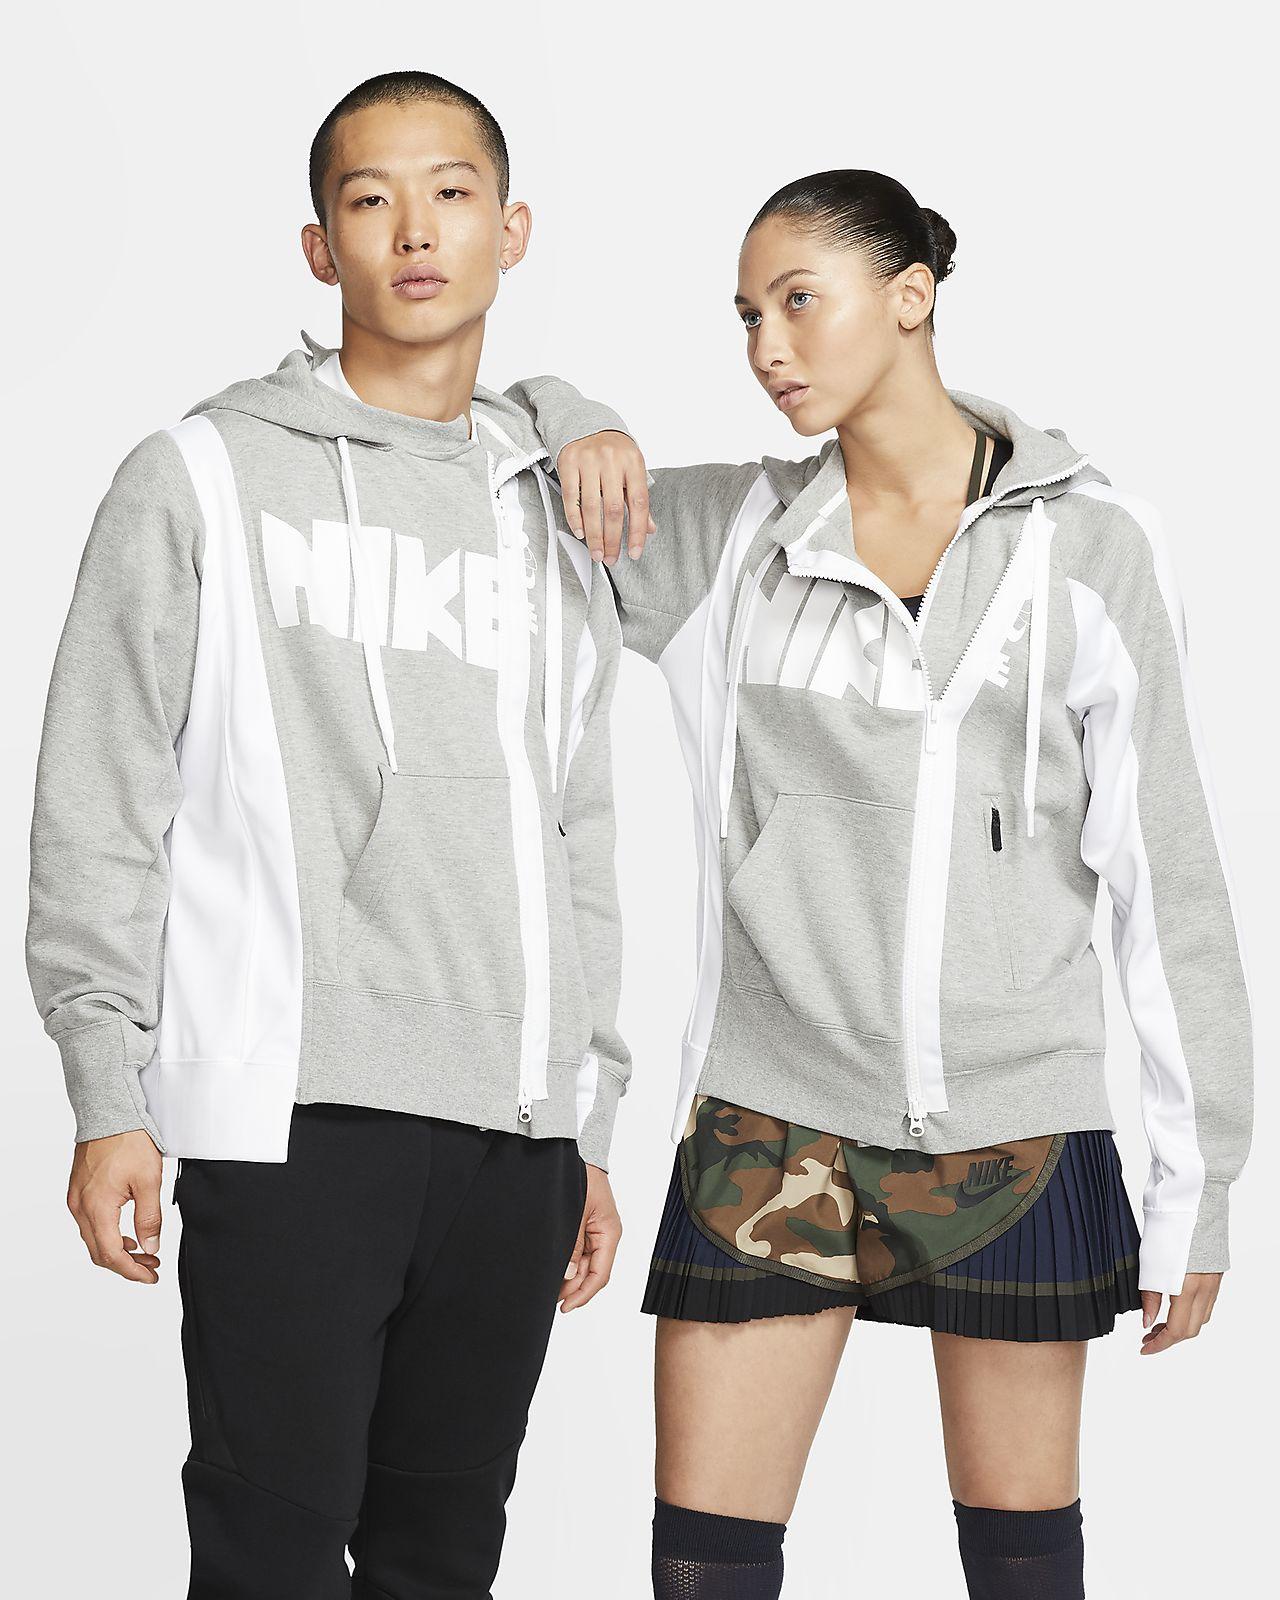 Nike x Sacai 女子双拉链连帽衫